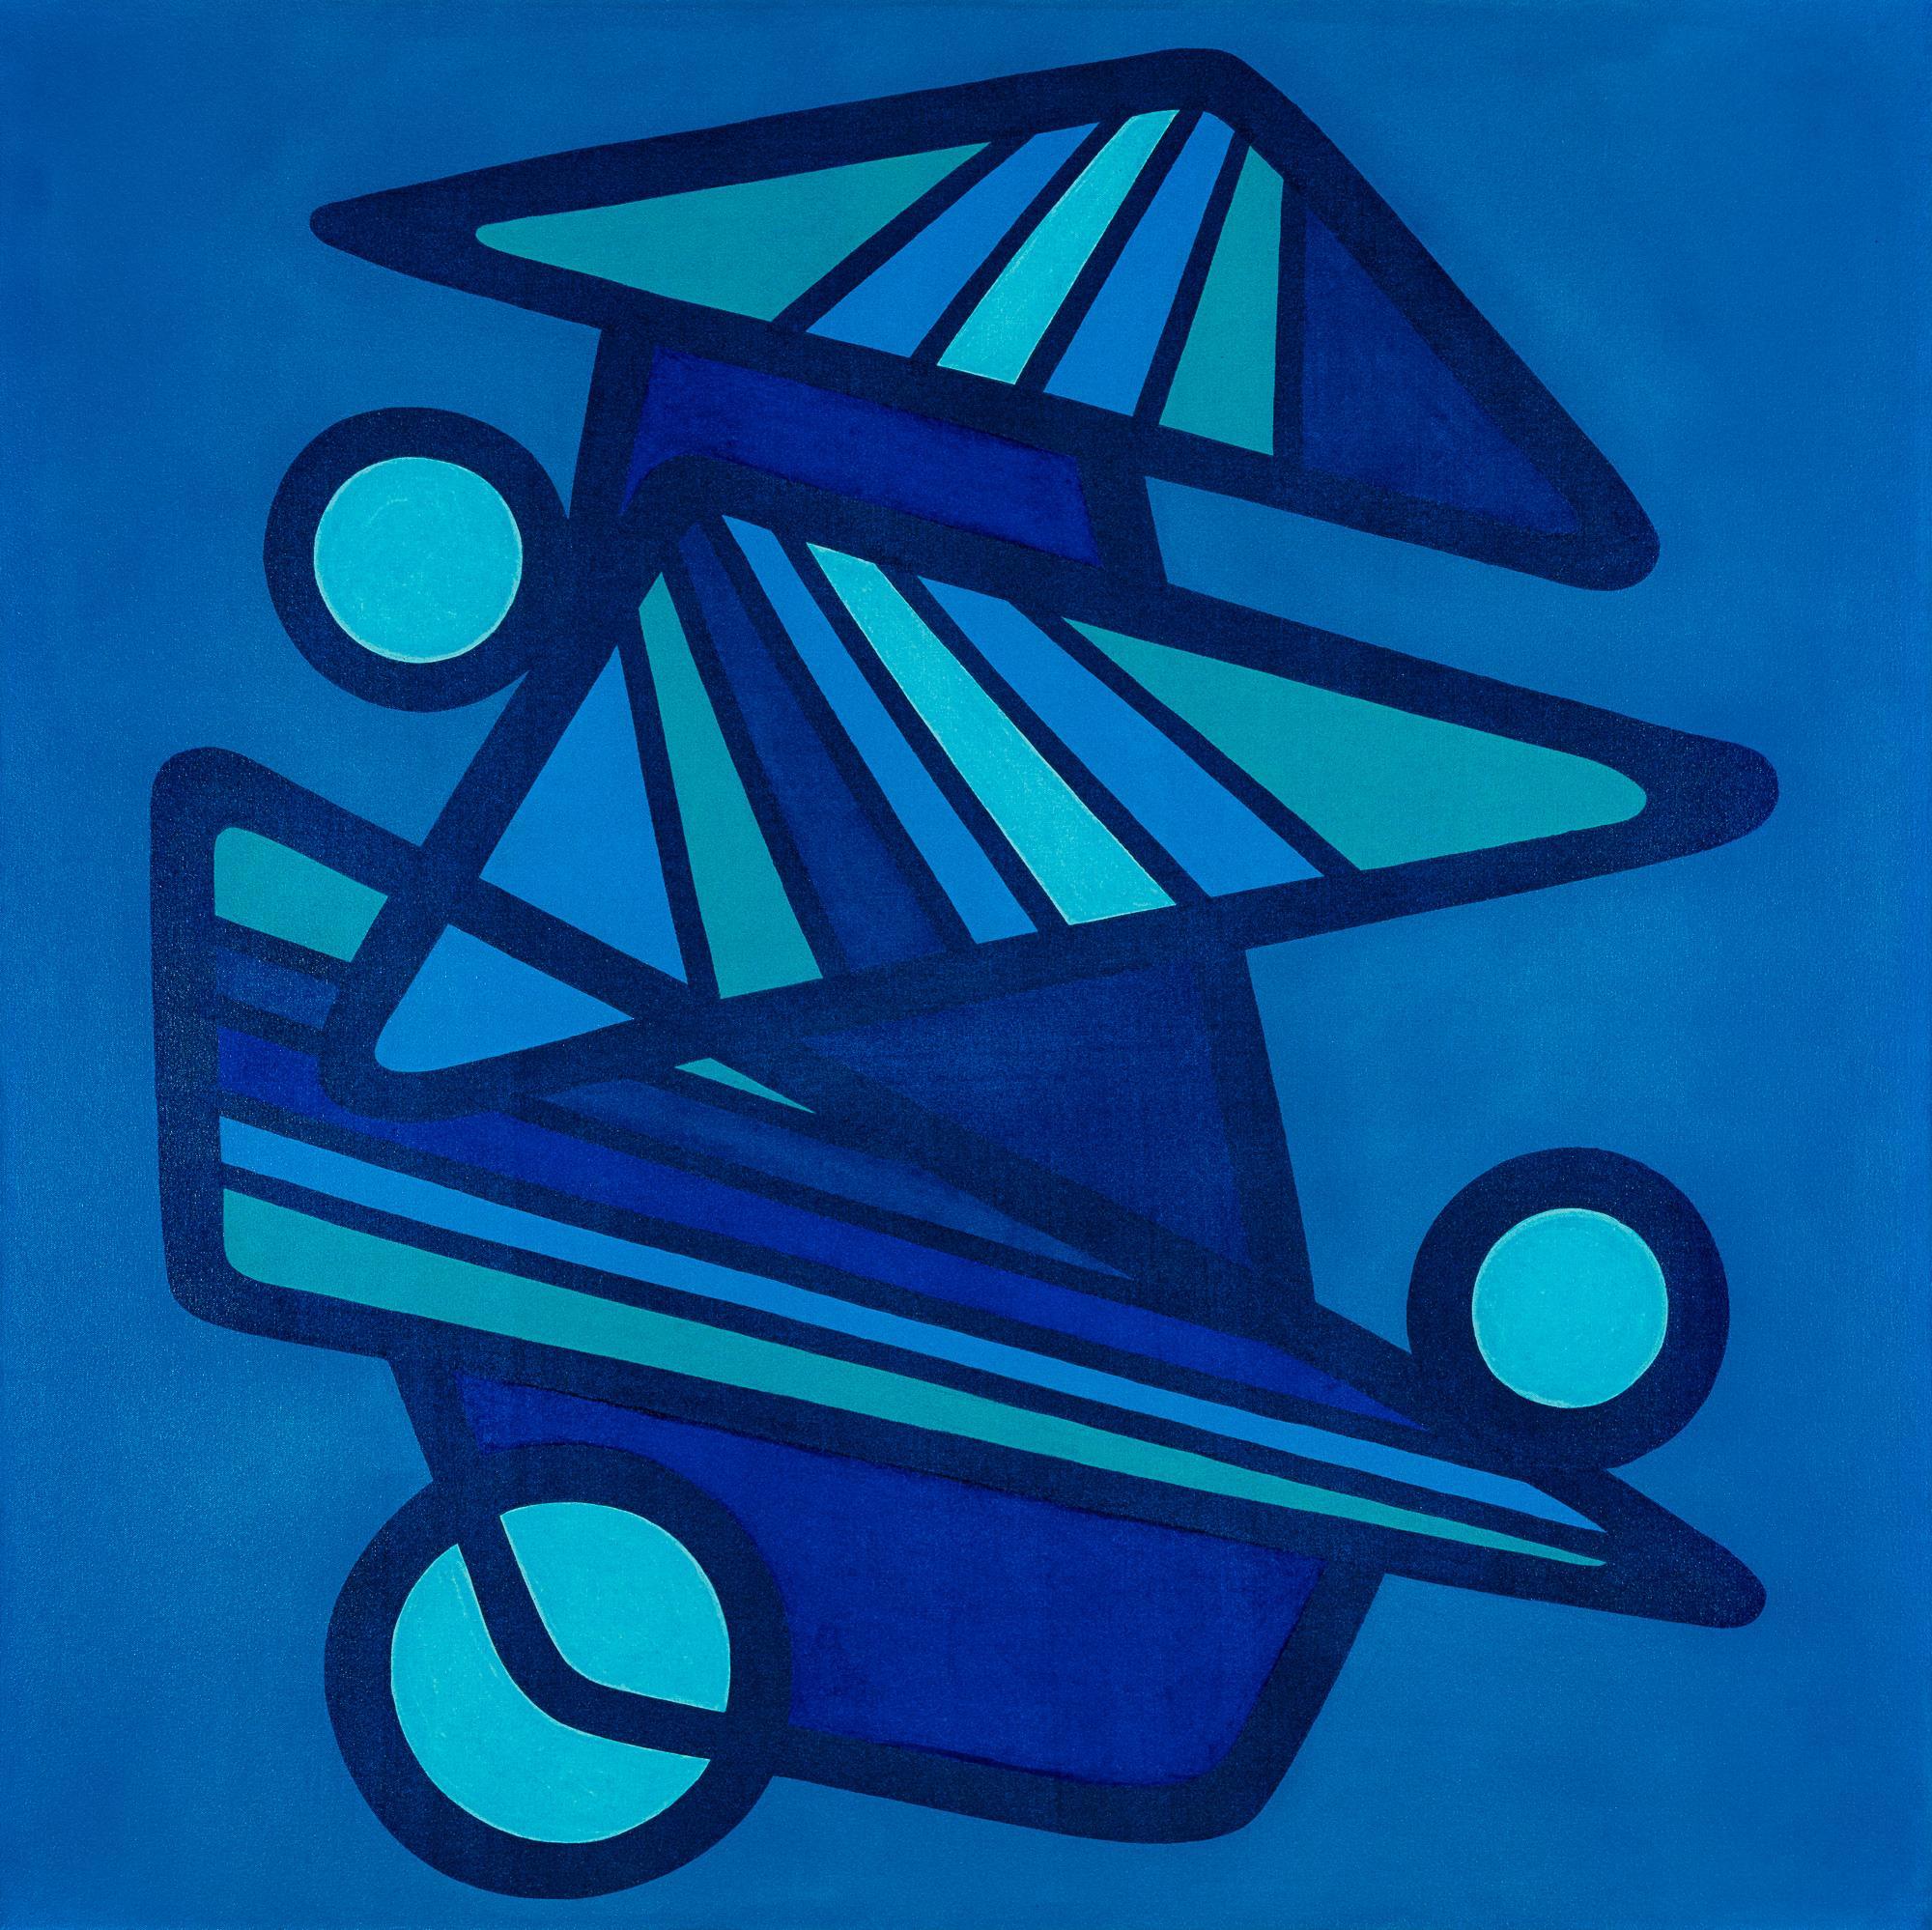 BARANADA BLUES #3 - blue geometric abstraction